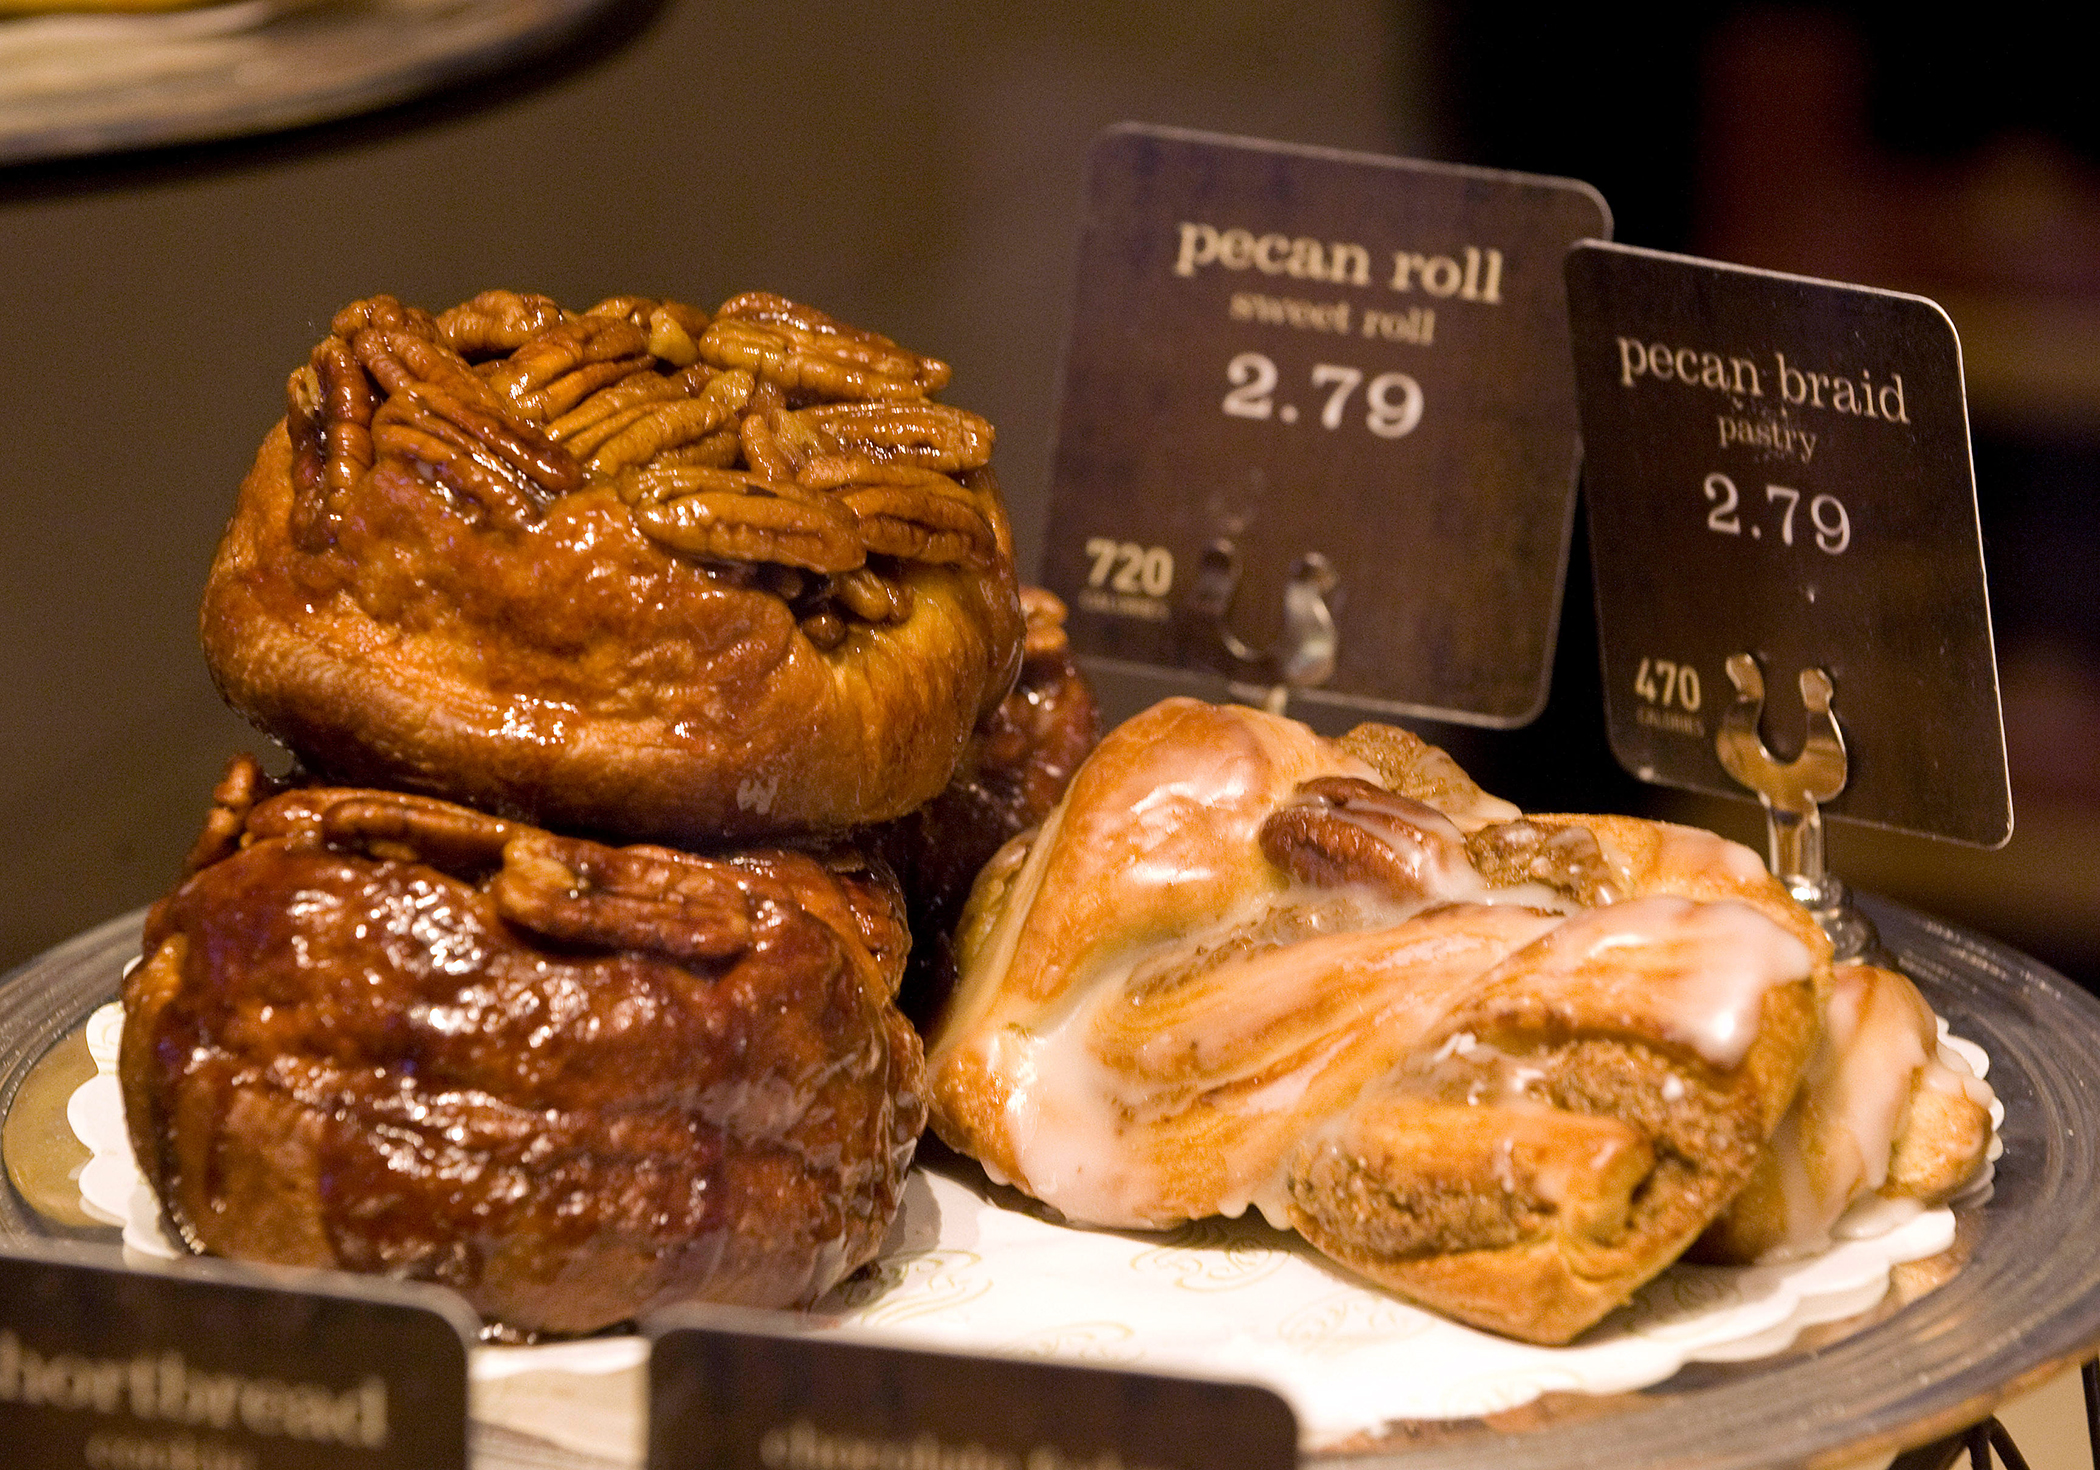 Panera bakery items